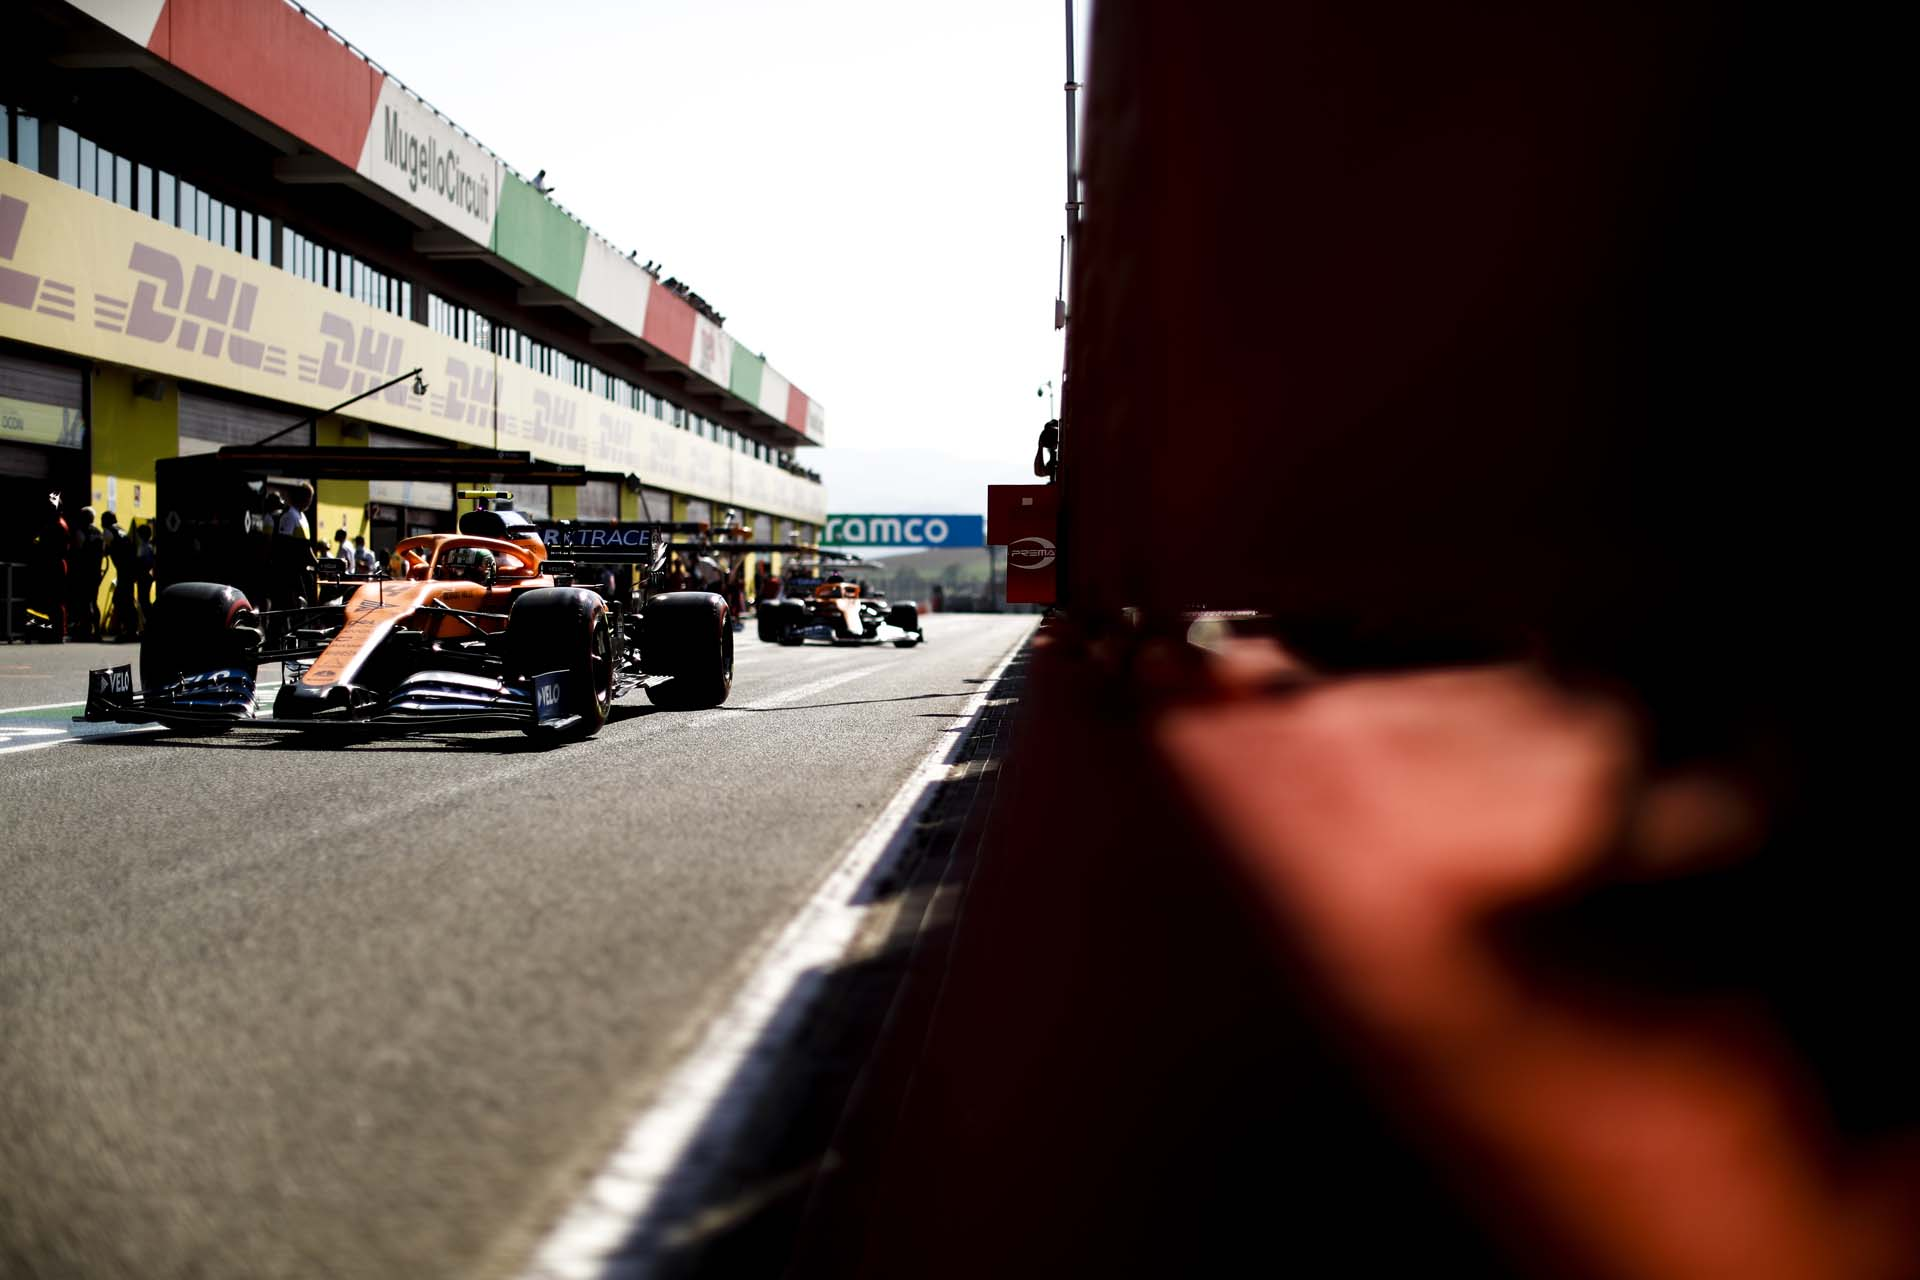 Lando Norris, McLaren MCL35, leads Carlos Sainz, McLaren MCL35, in the pit lane